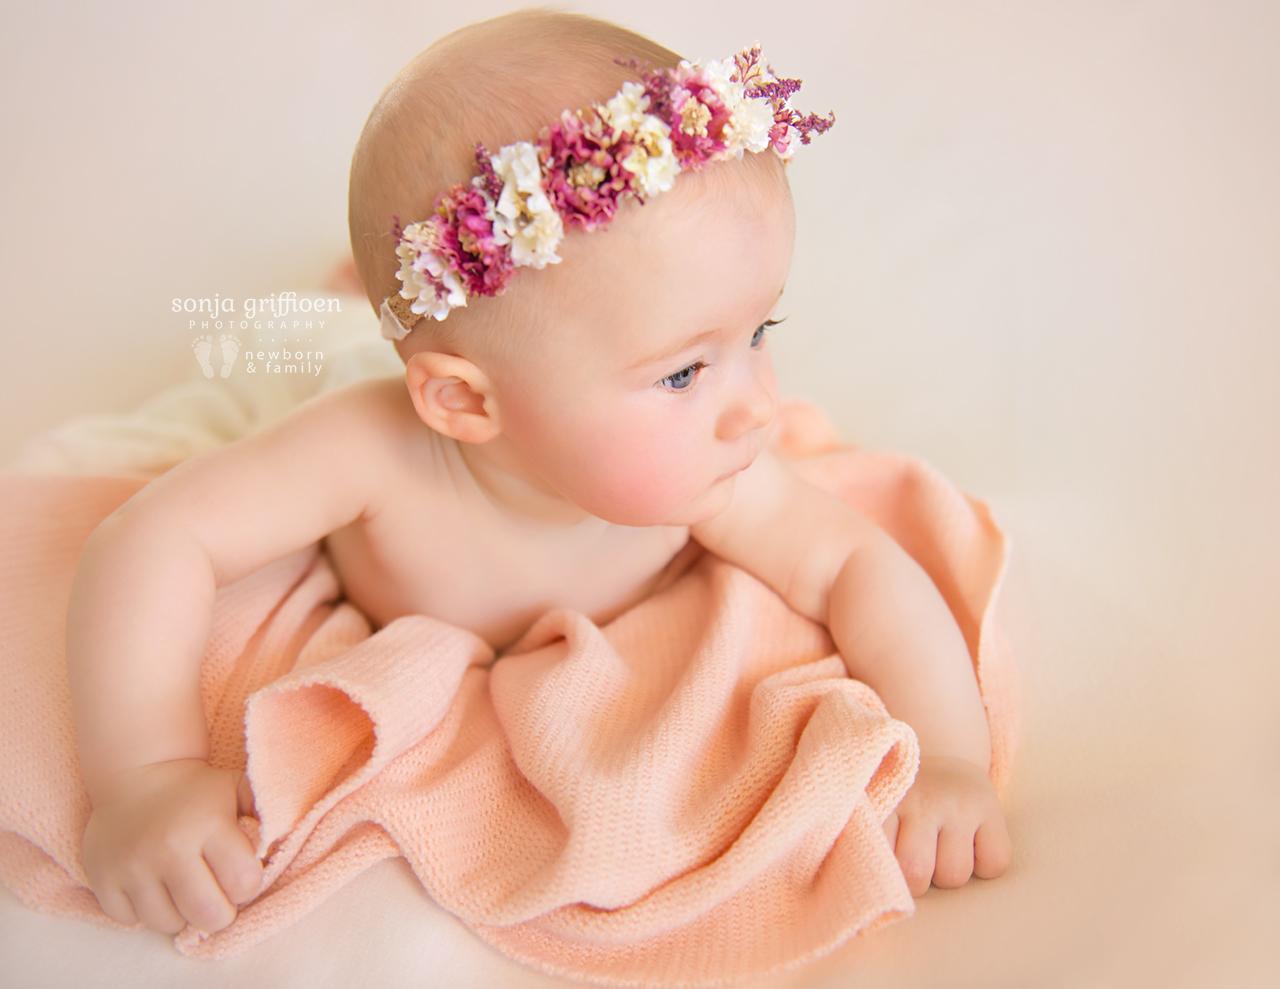 Amelia-Sitter-Brisbane-Newborn-Photographer-Sonja-Griffioen-08.jpg